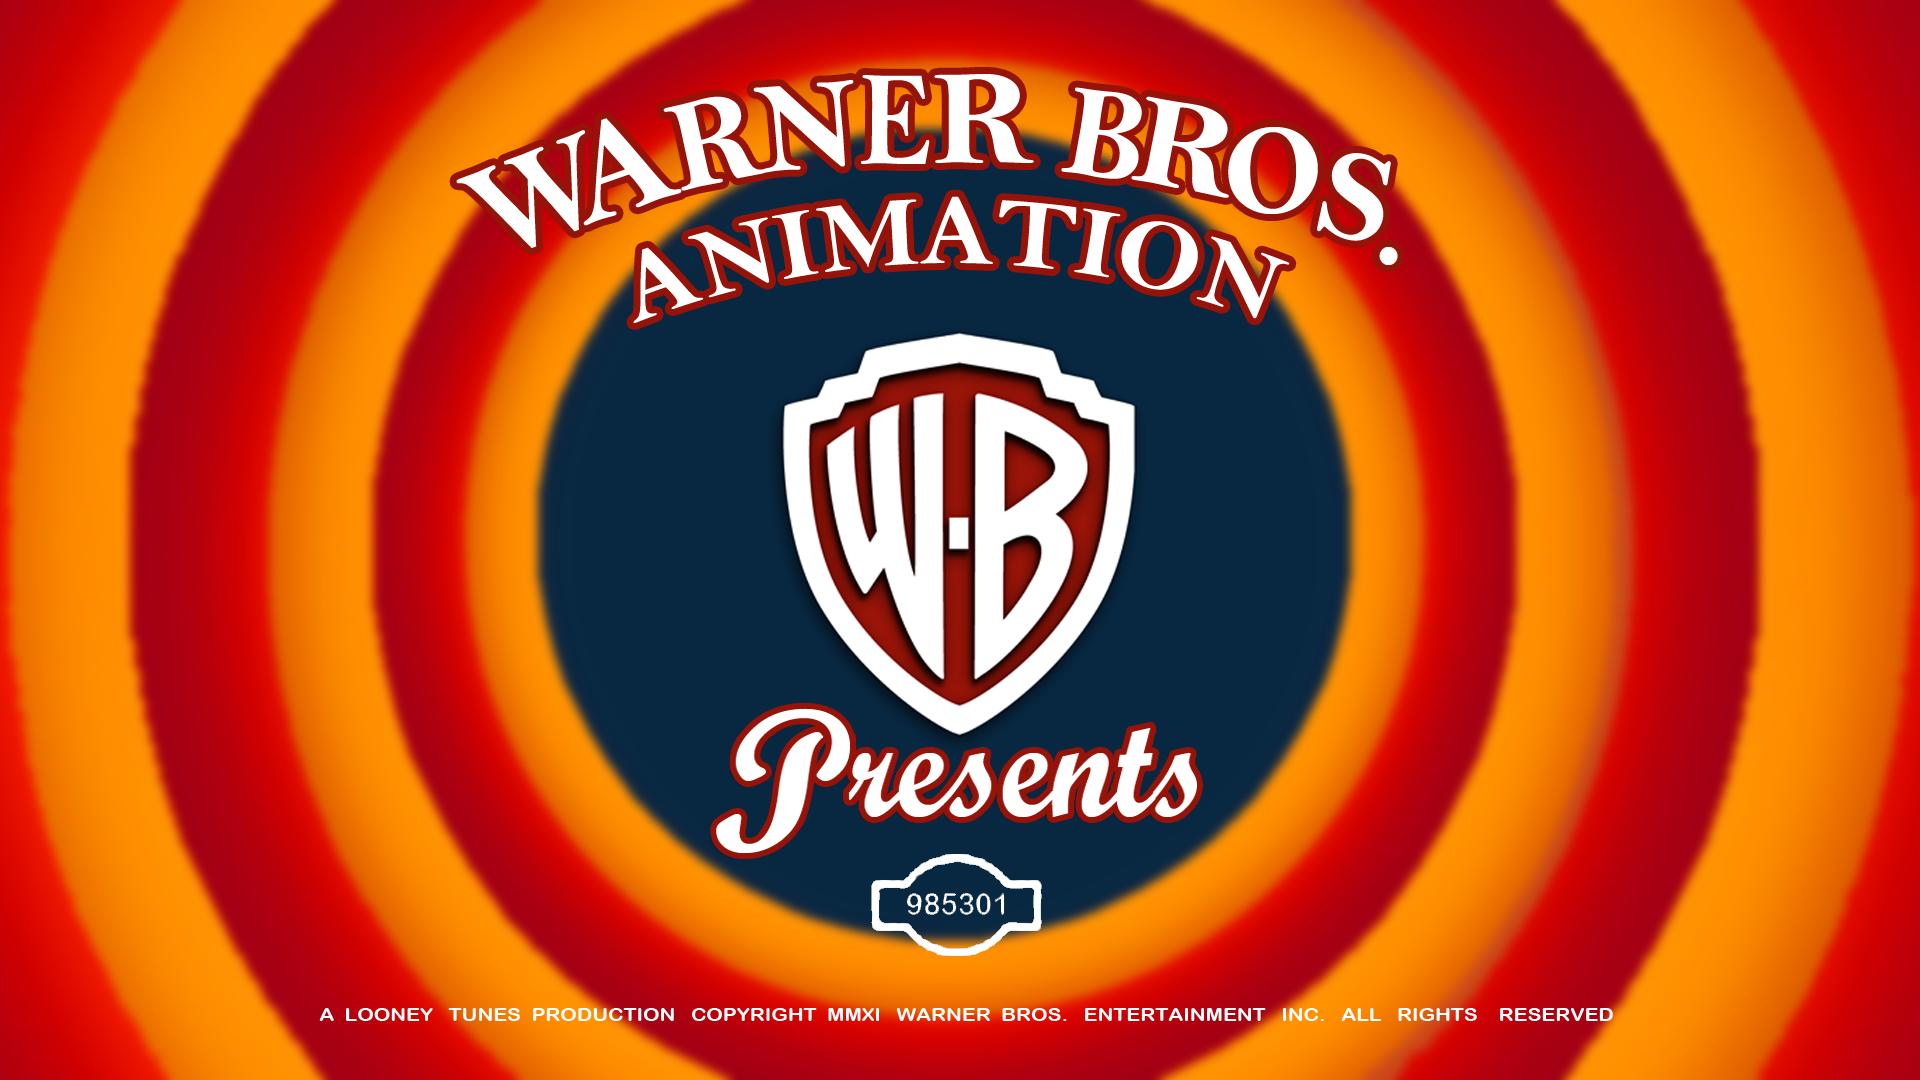 warner bros HD Wallpaper Background Image 1920x1080 ID 1920x1080